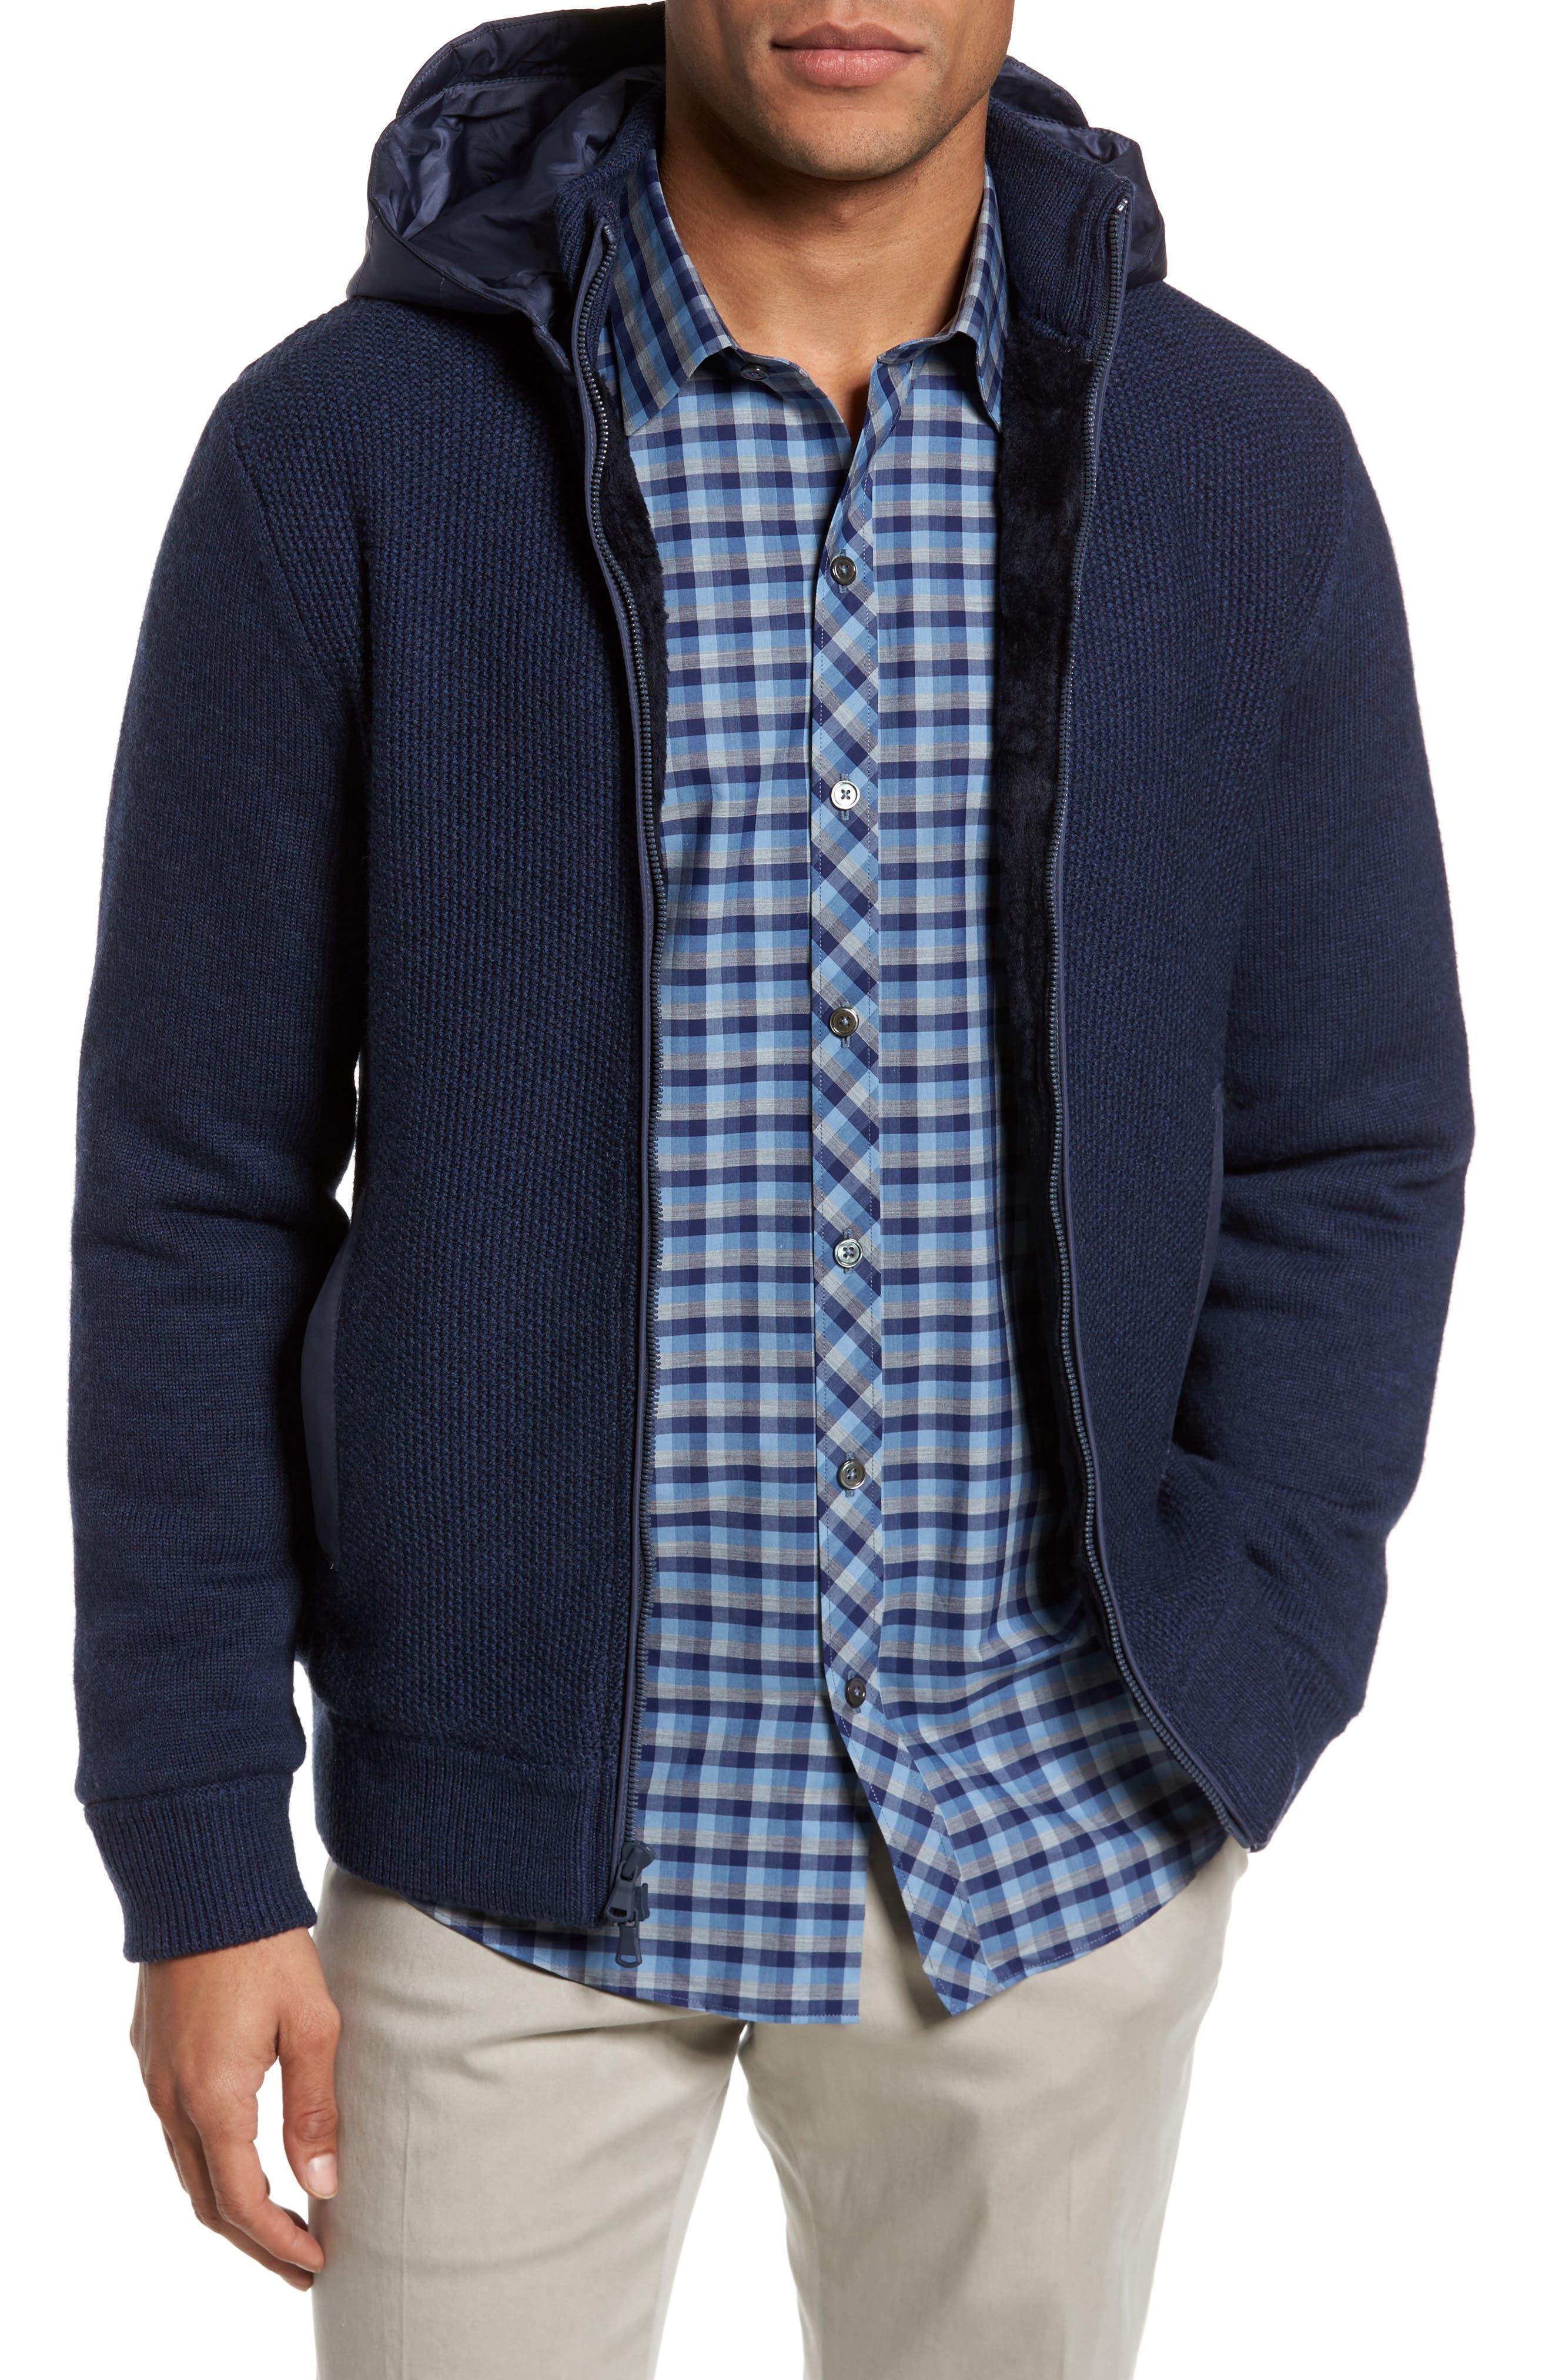 Haydon Merino Wool Sweater Jacket,                             Main thumbnail 1, color,                             410